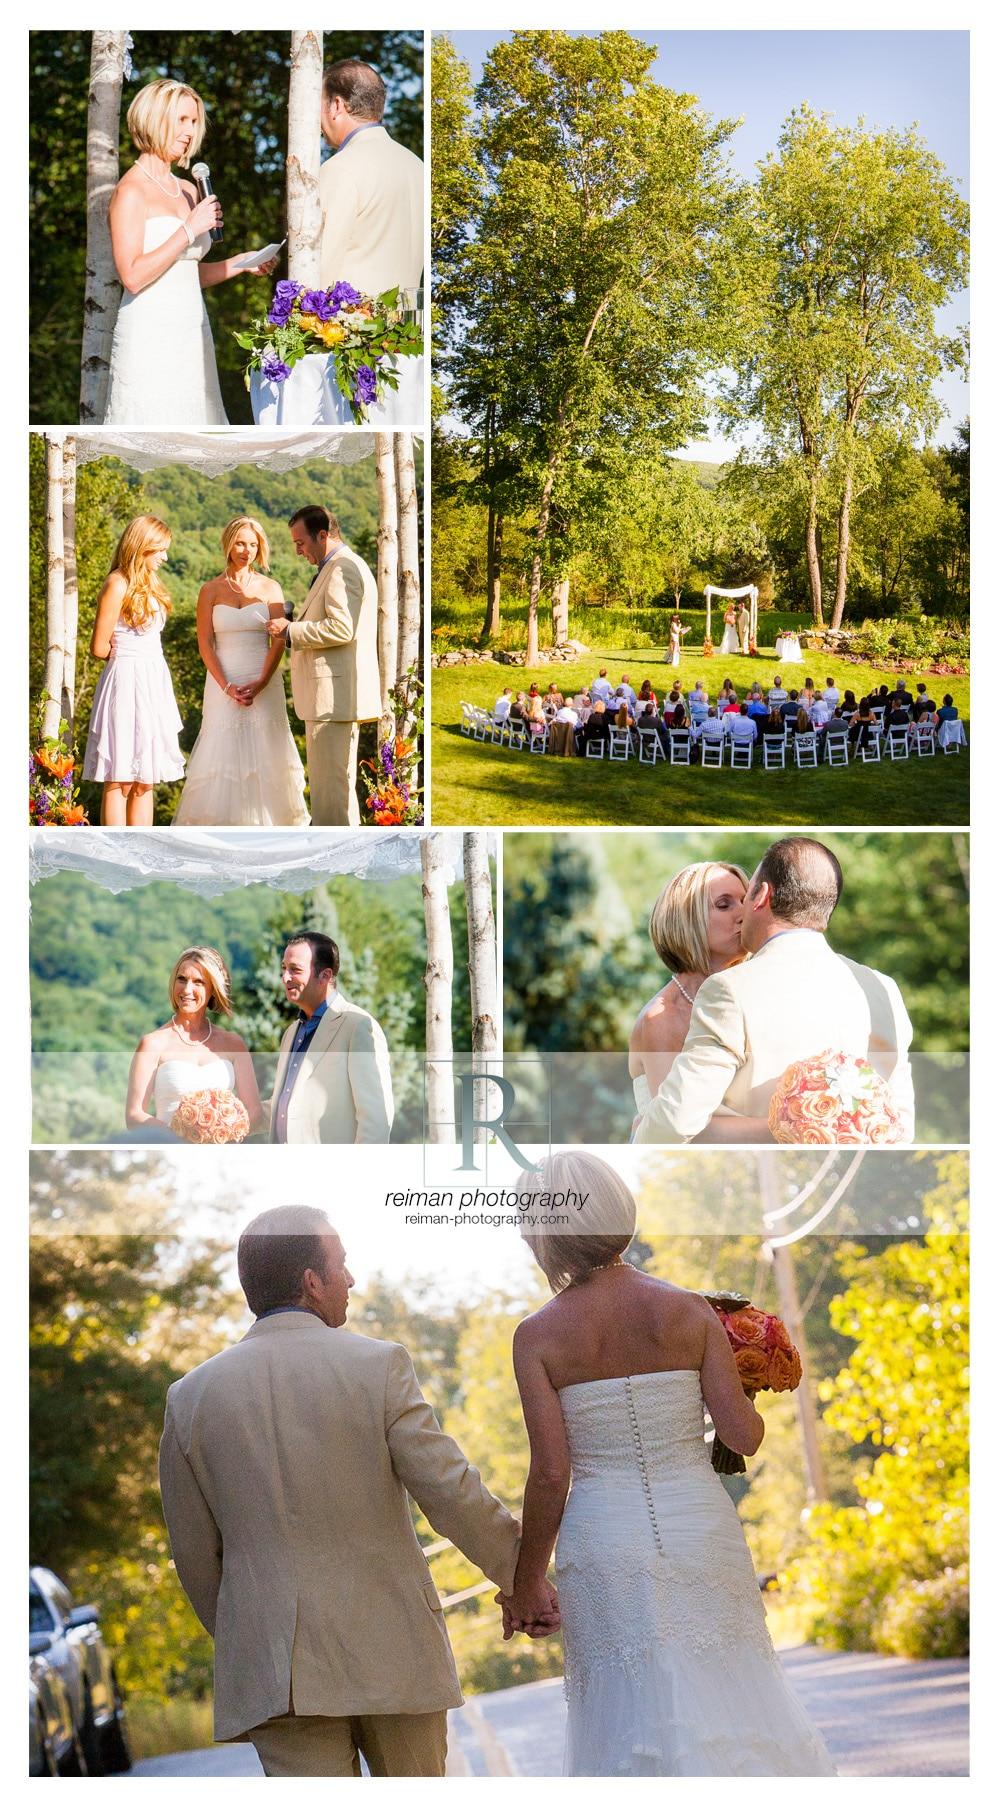 Wedding in The Berkshires, Reiman Photography, Elegant